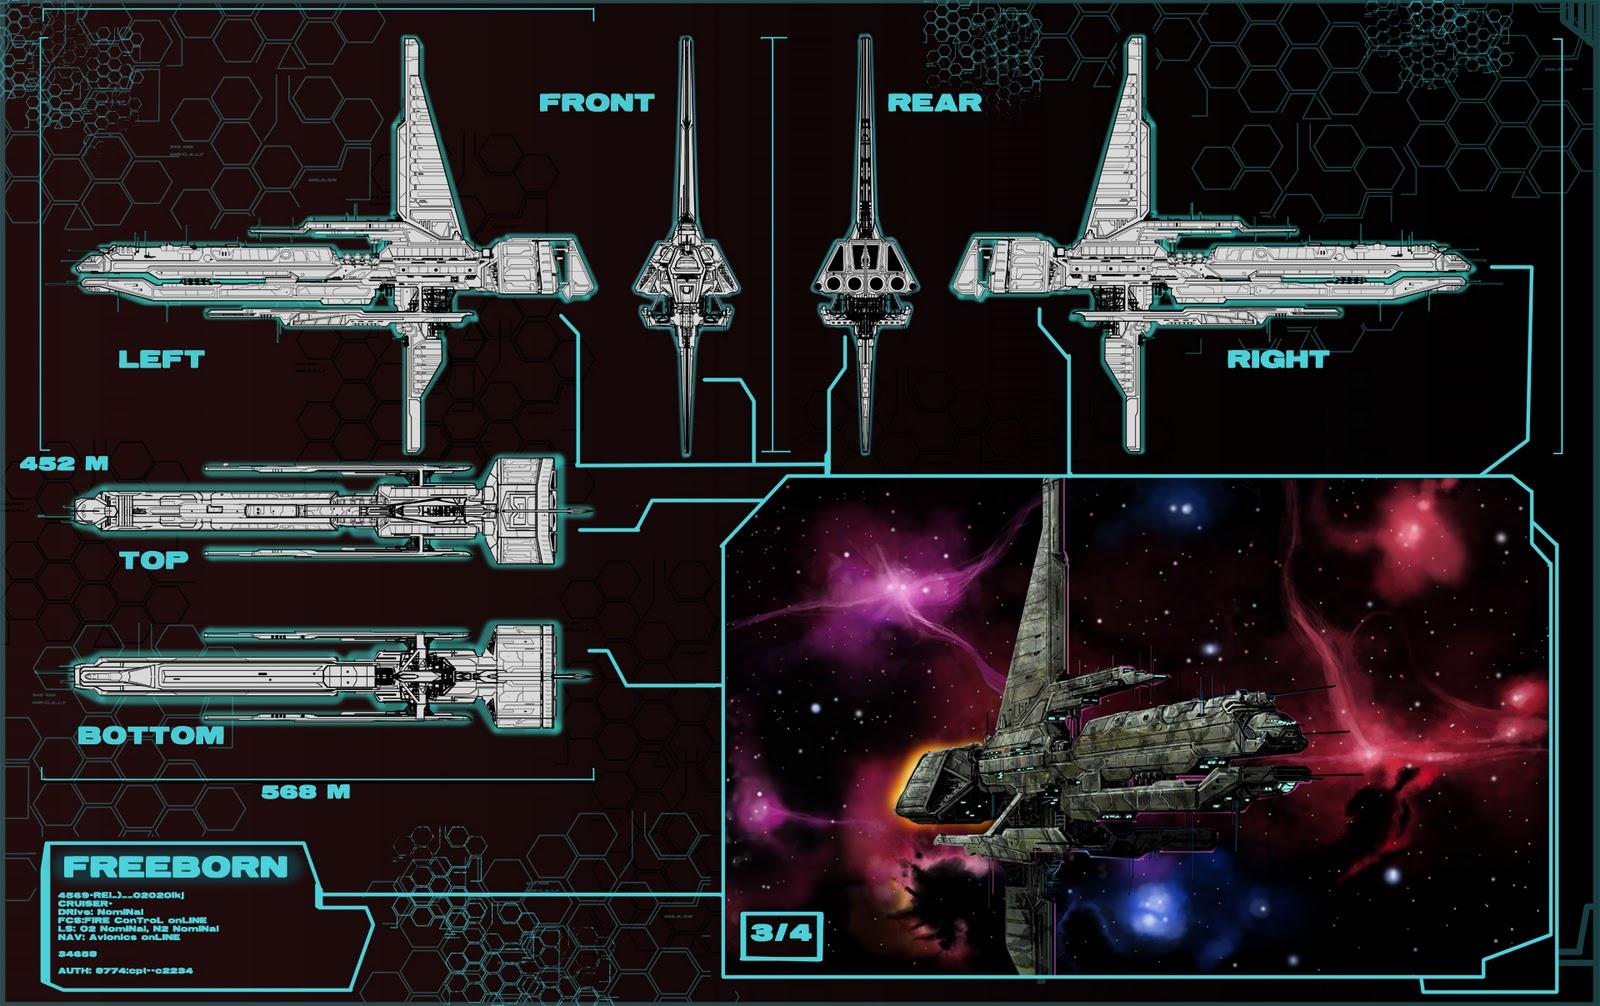 http://1.bp.blogspot.com/_be6qoCFrxrY/TK6cFoqWzBI/AAAAAAAAADQ/D8zRY4mofYI/s1600/EVE_Online_Ship_Concept_2%2B.jpg